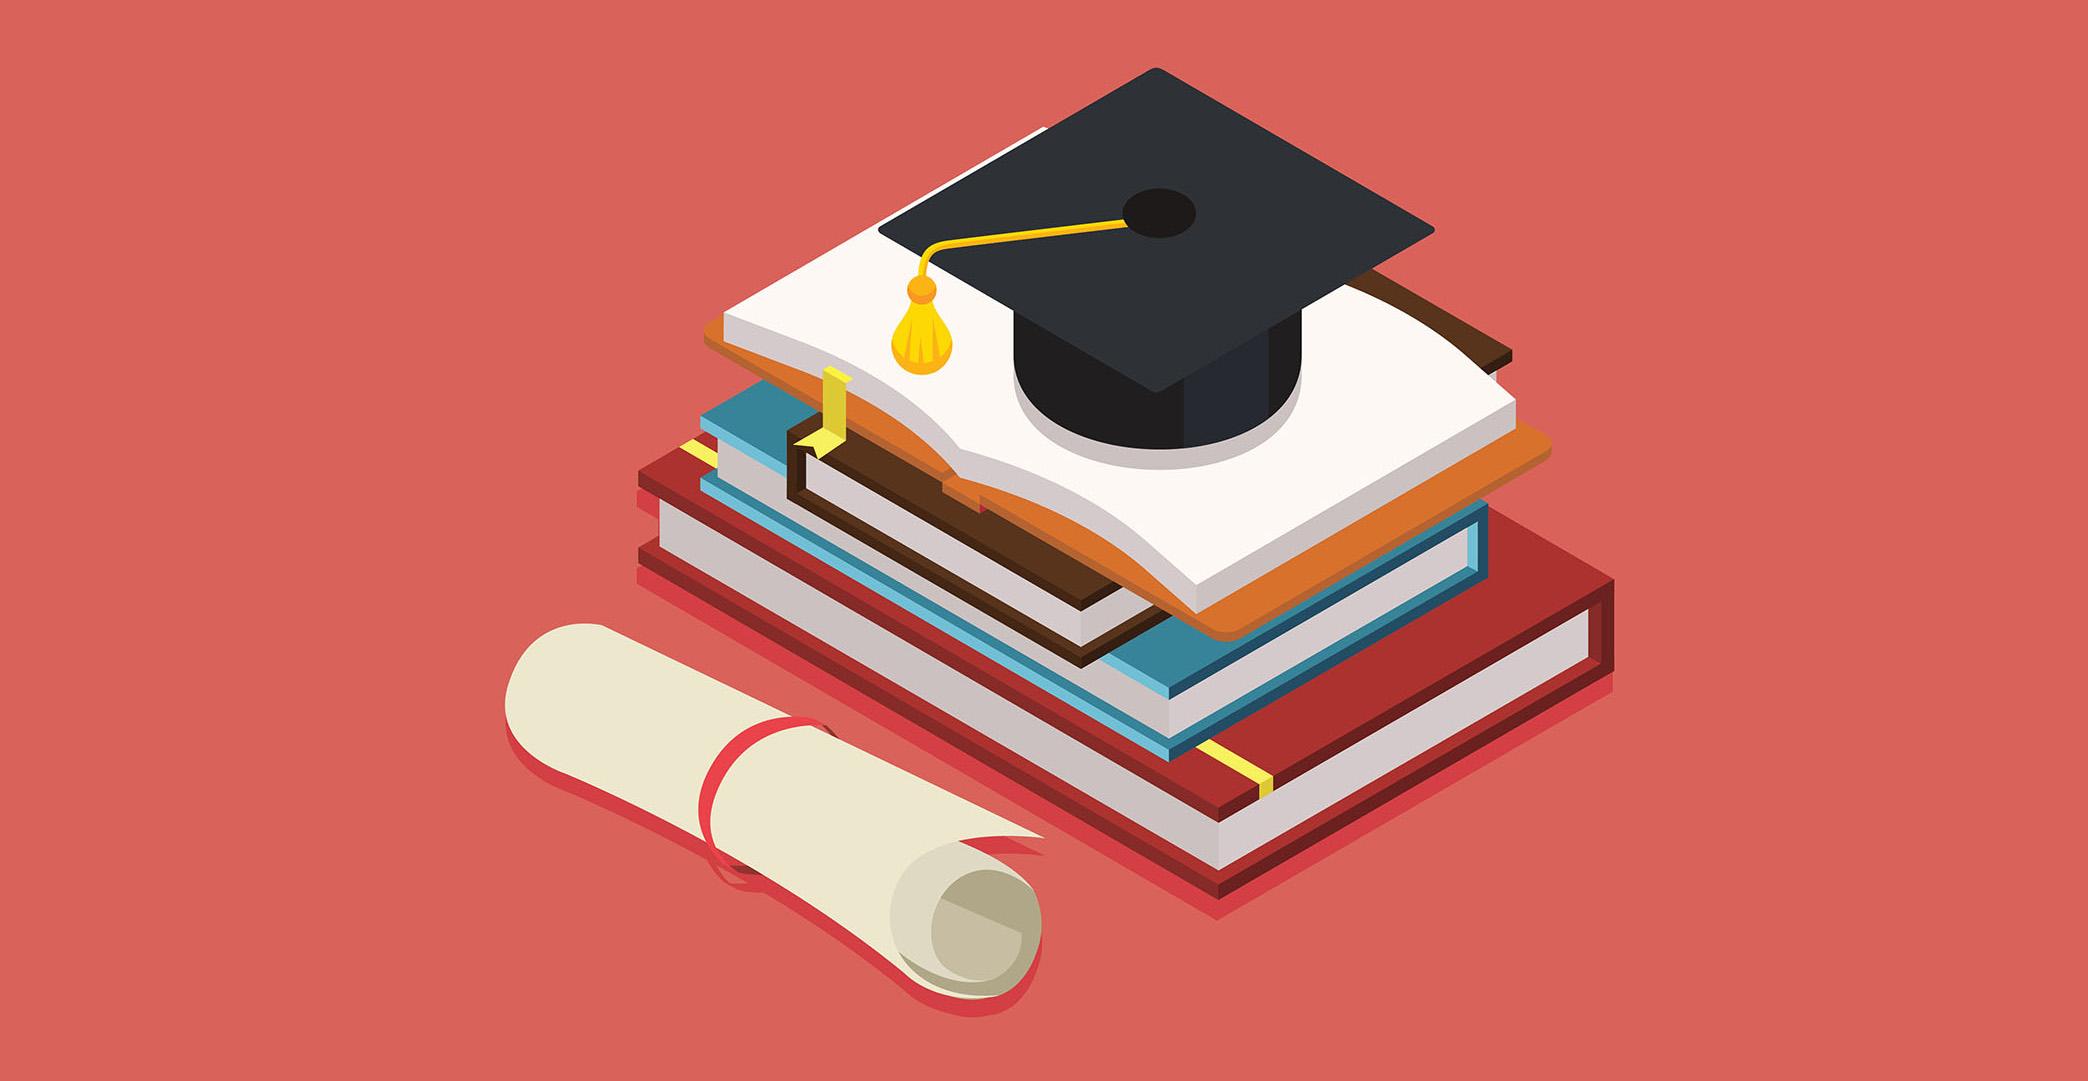 diploma-graduation-isometric-free-vector182578617265125.jpg